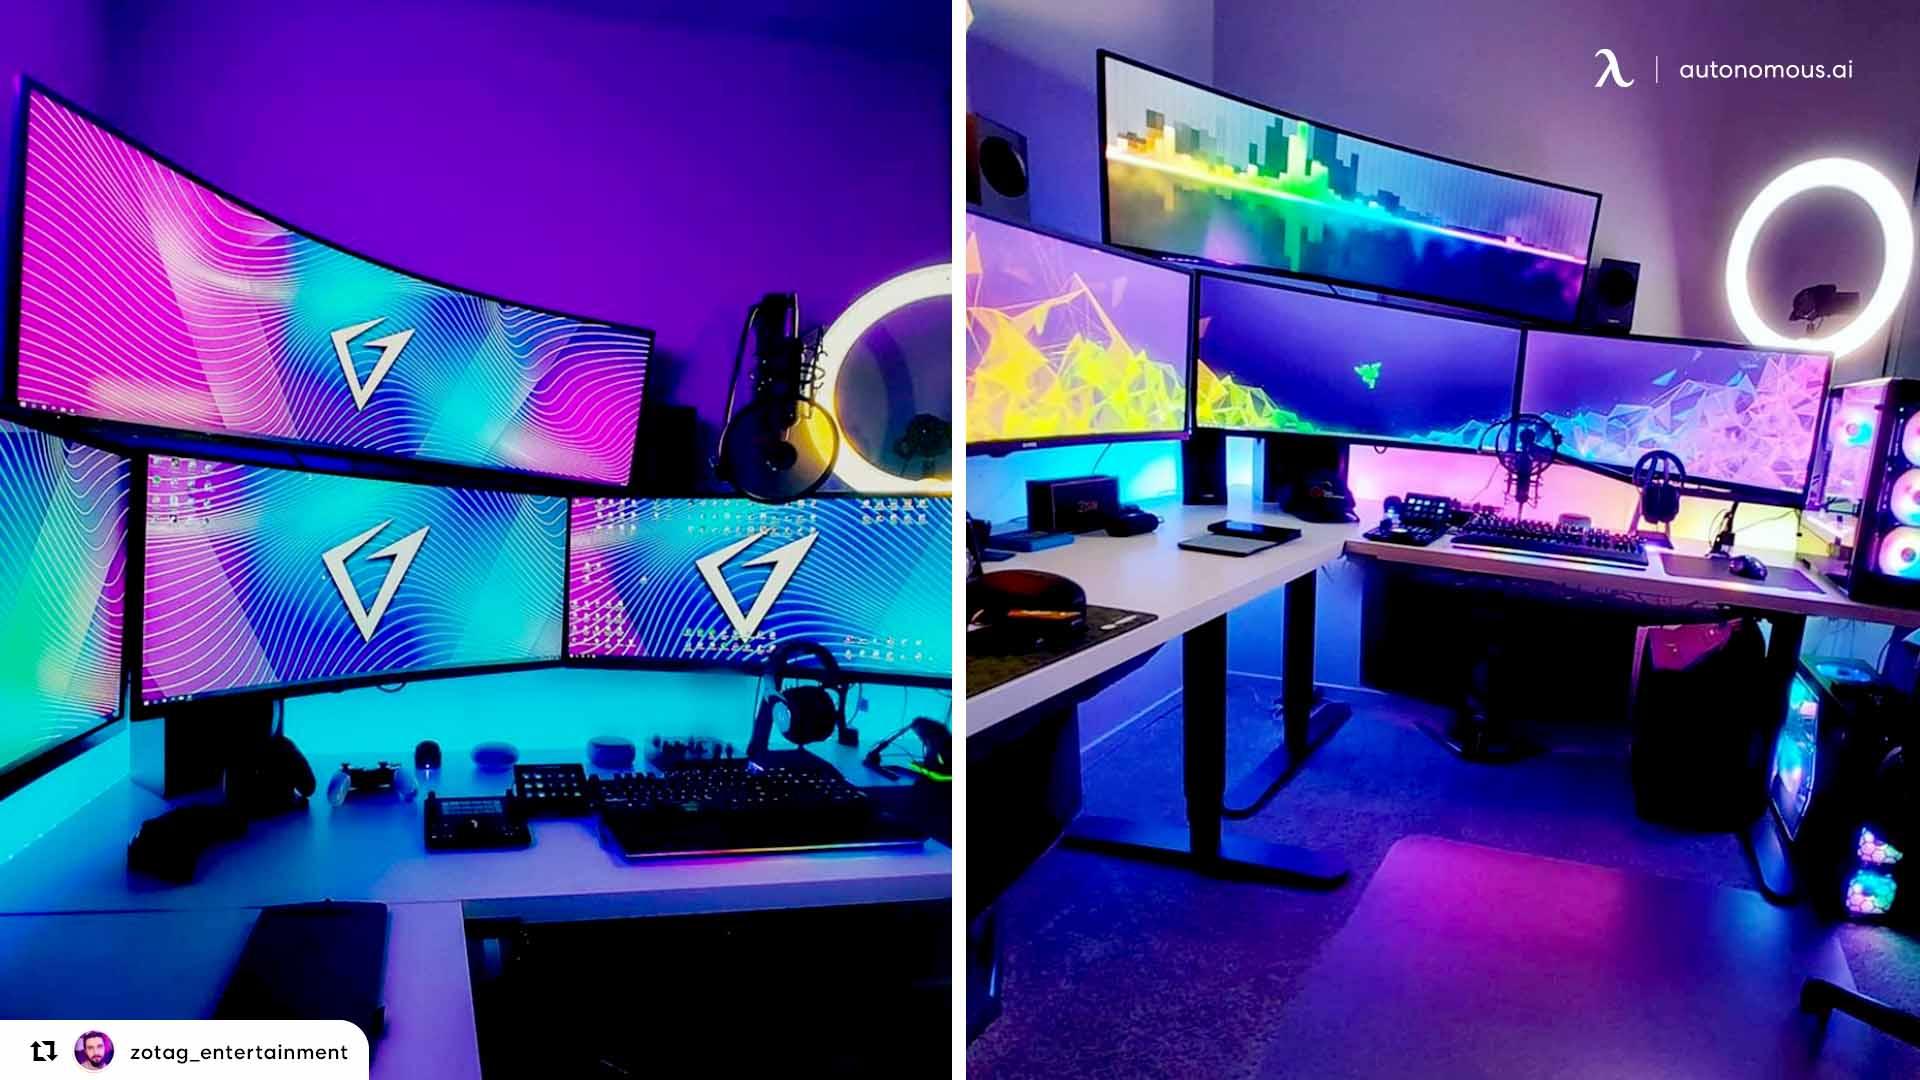 Add Some Vibrant Lights